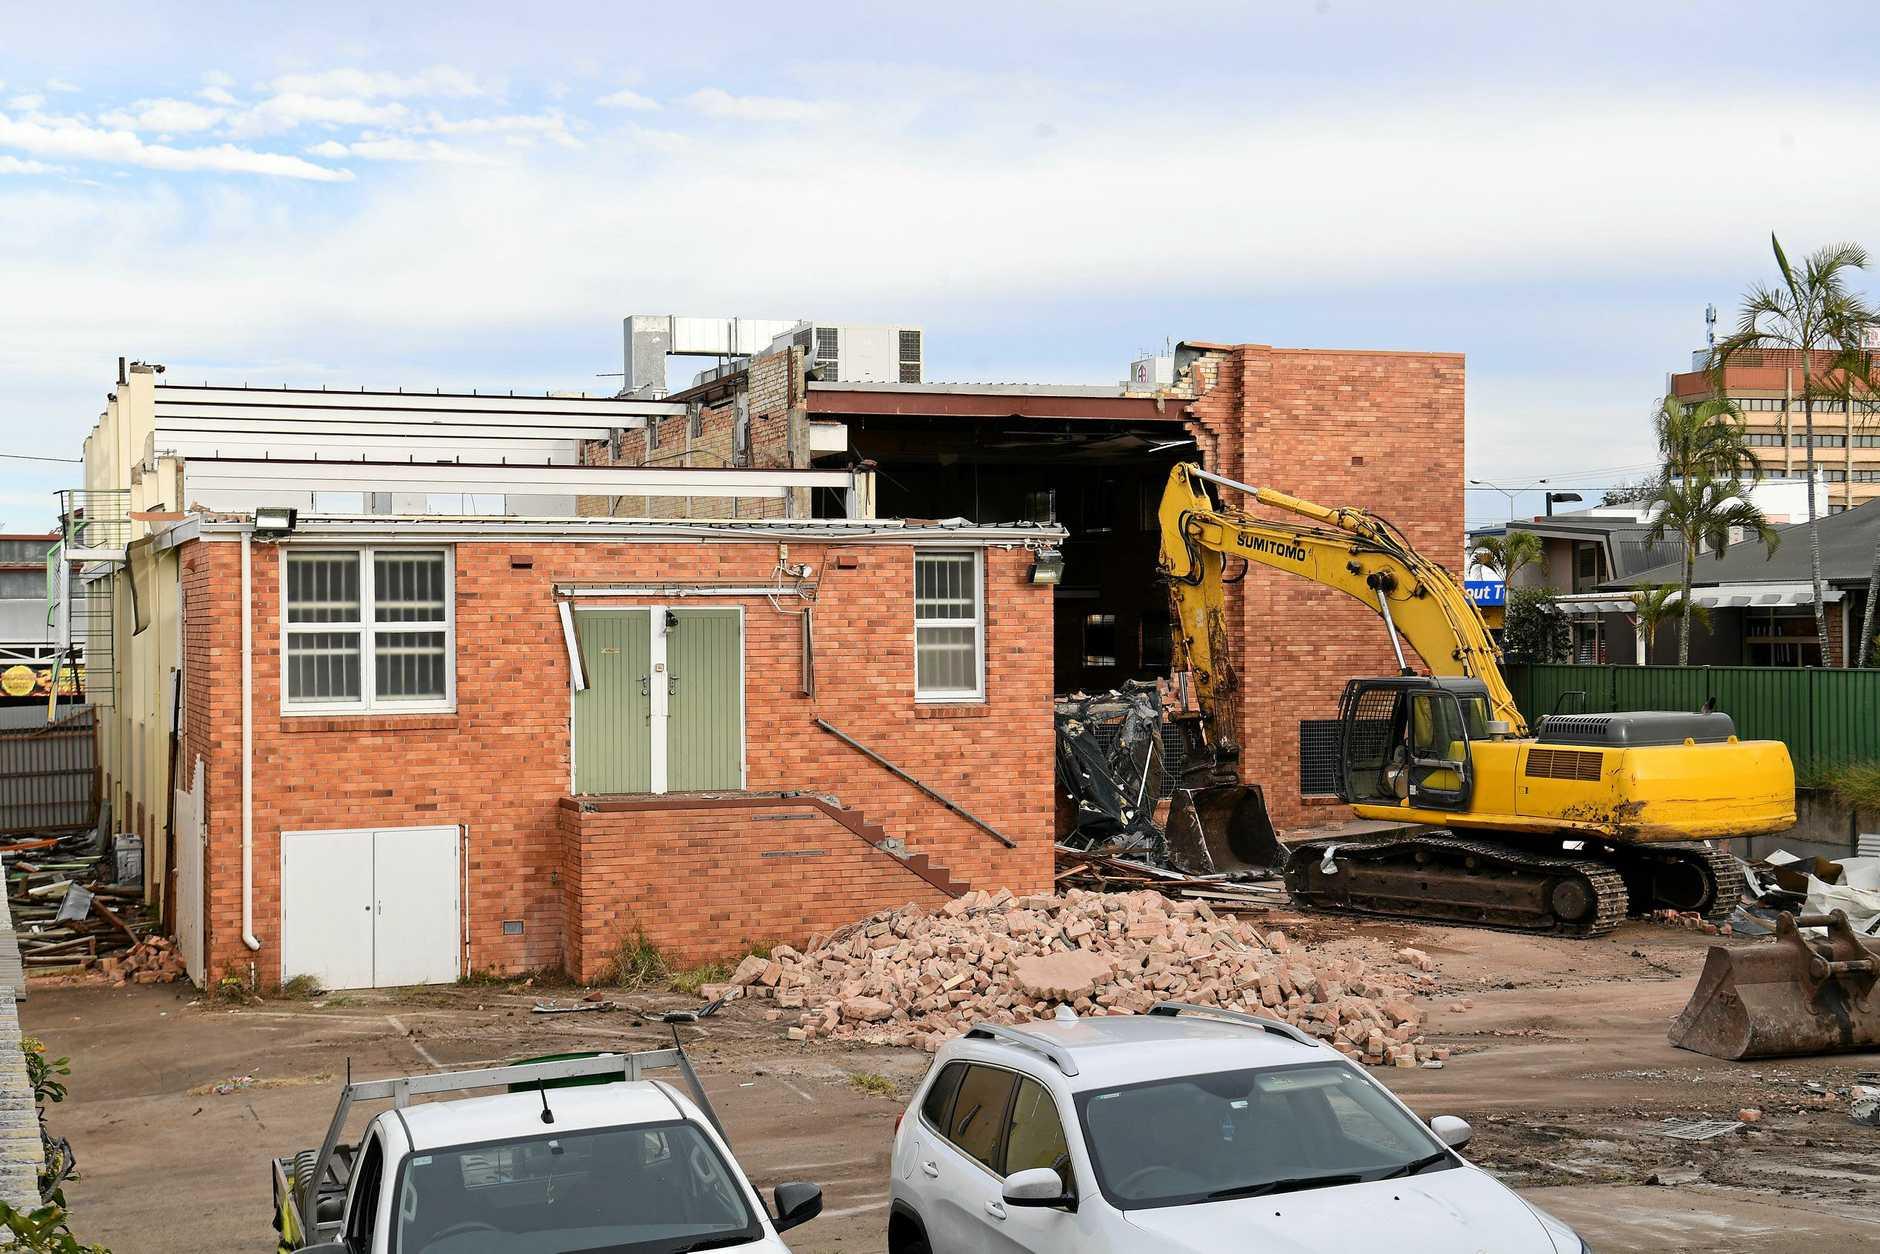 HERITAGE DESTRUCTION: The Salvation Army Citadel in Targo Street is  being demolished.